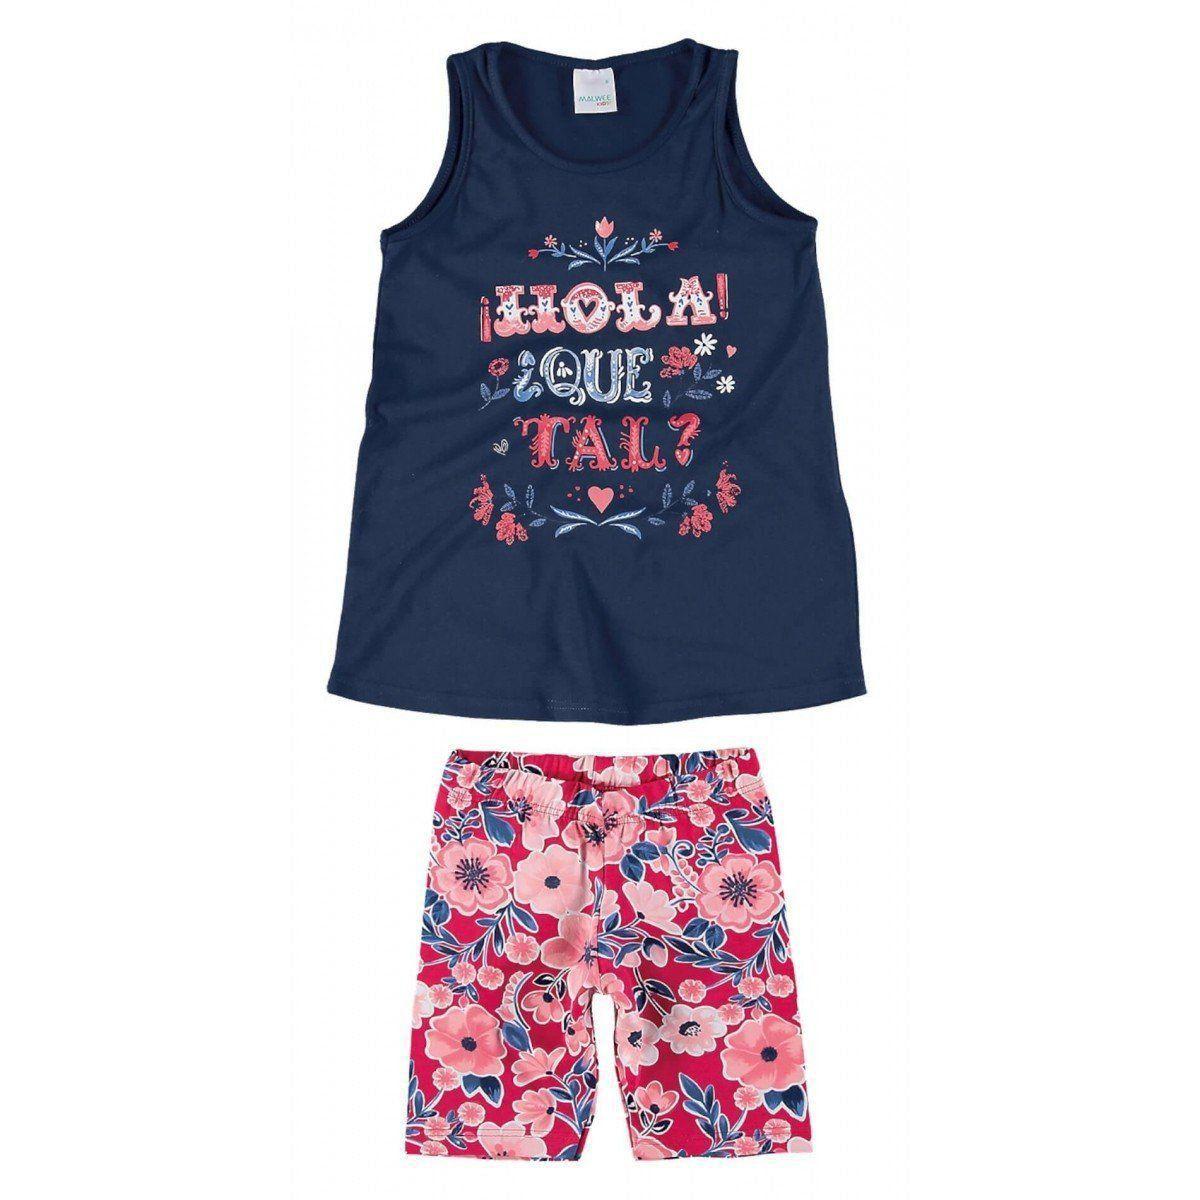 Conjunto Infantil Feminino Azul Marinho Hola Que Tal? Malwee